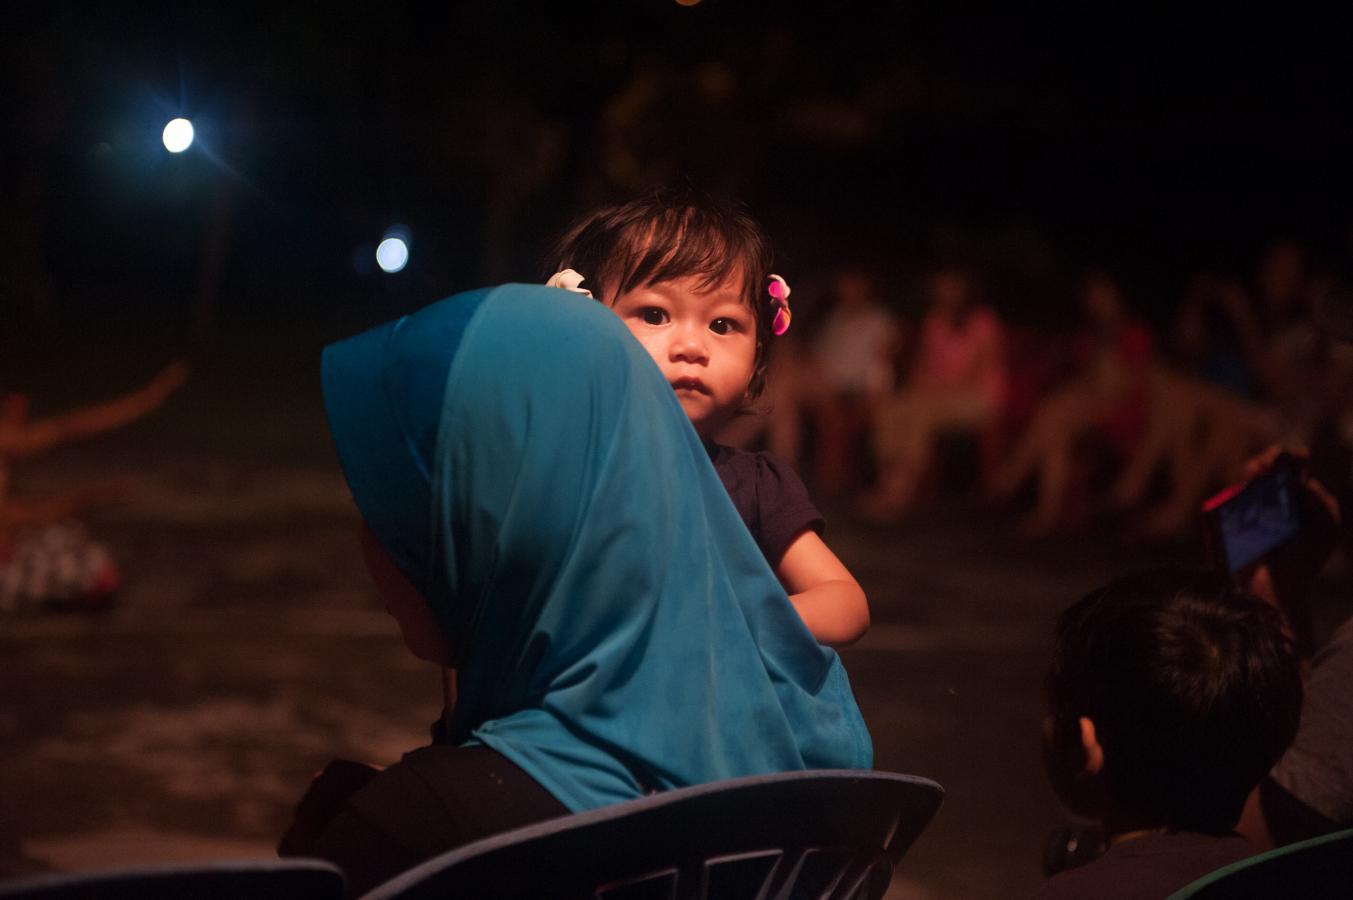 watching-the-kecak-dance-near-tanah-lot-bali-2013-